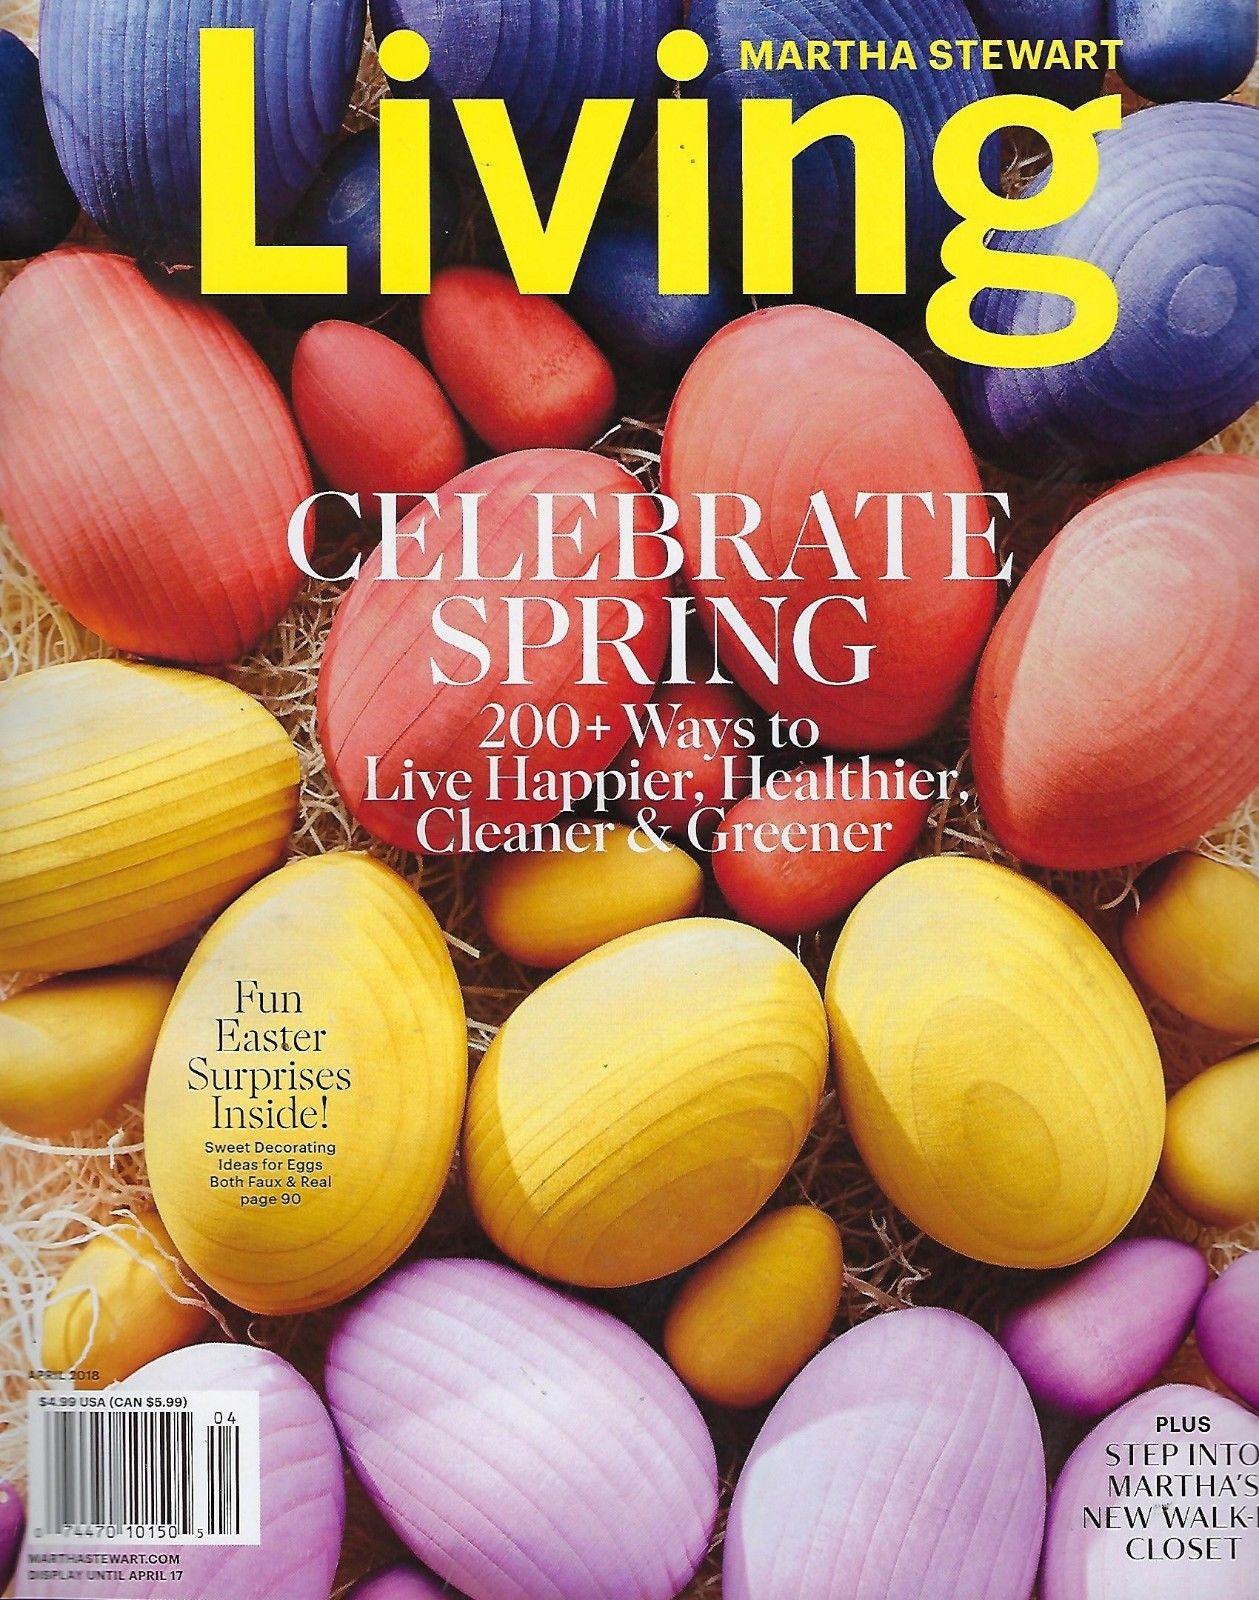 Martha Stewart Living - April 2018